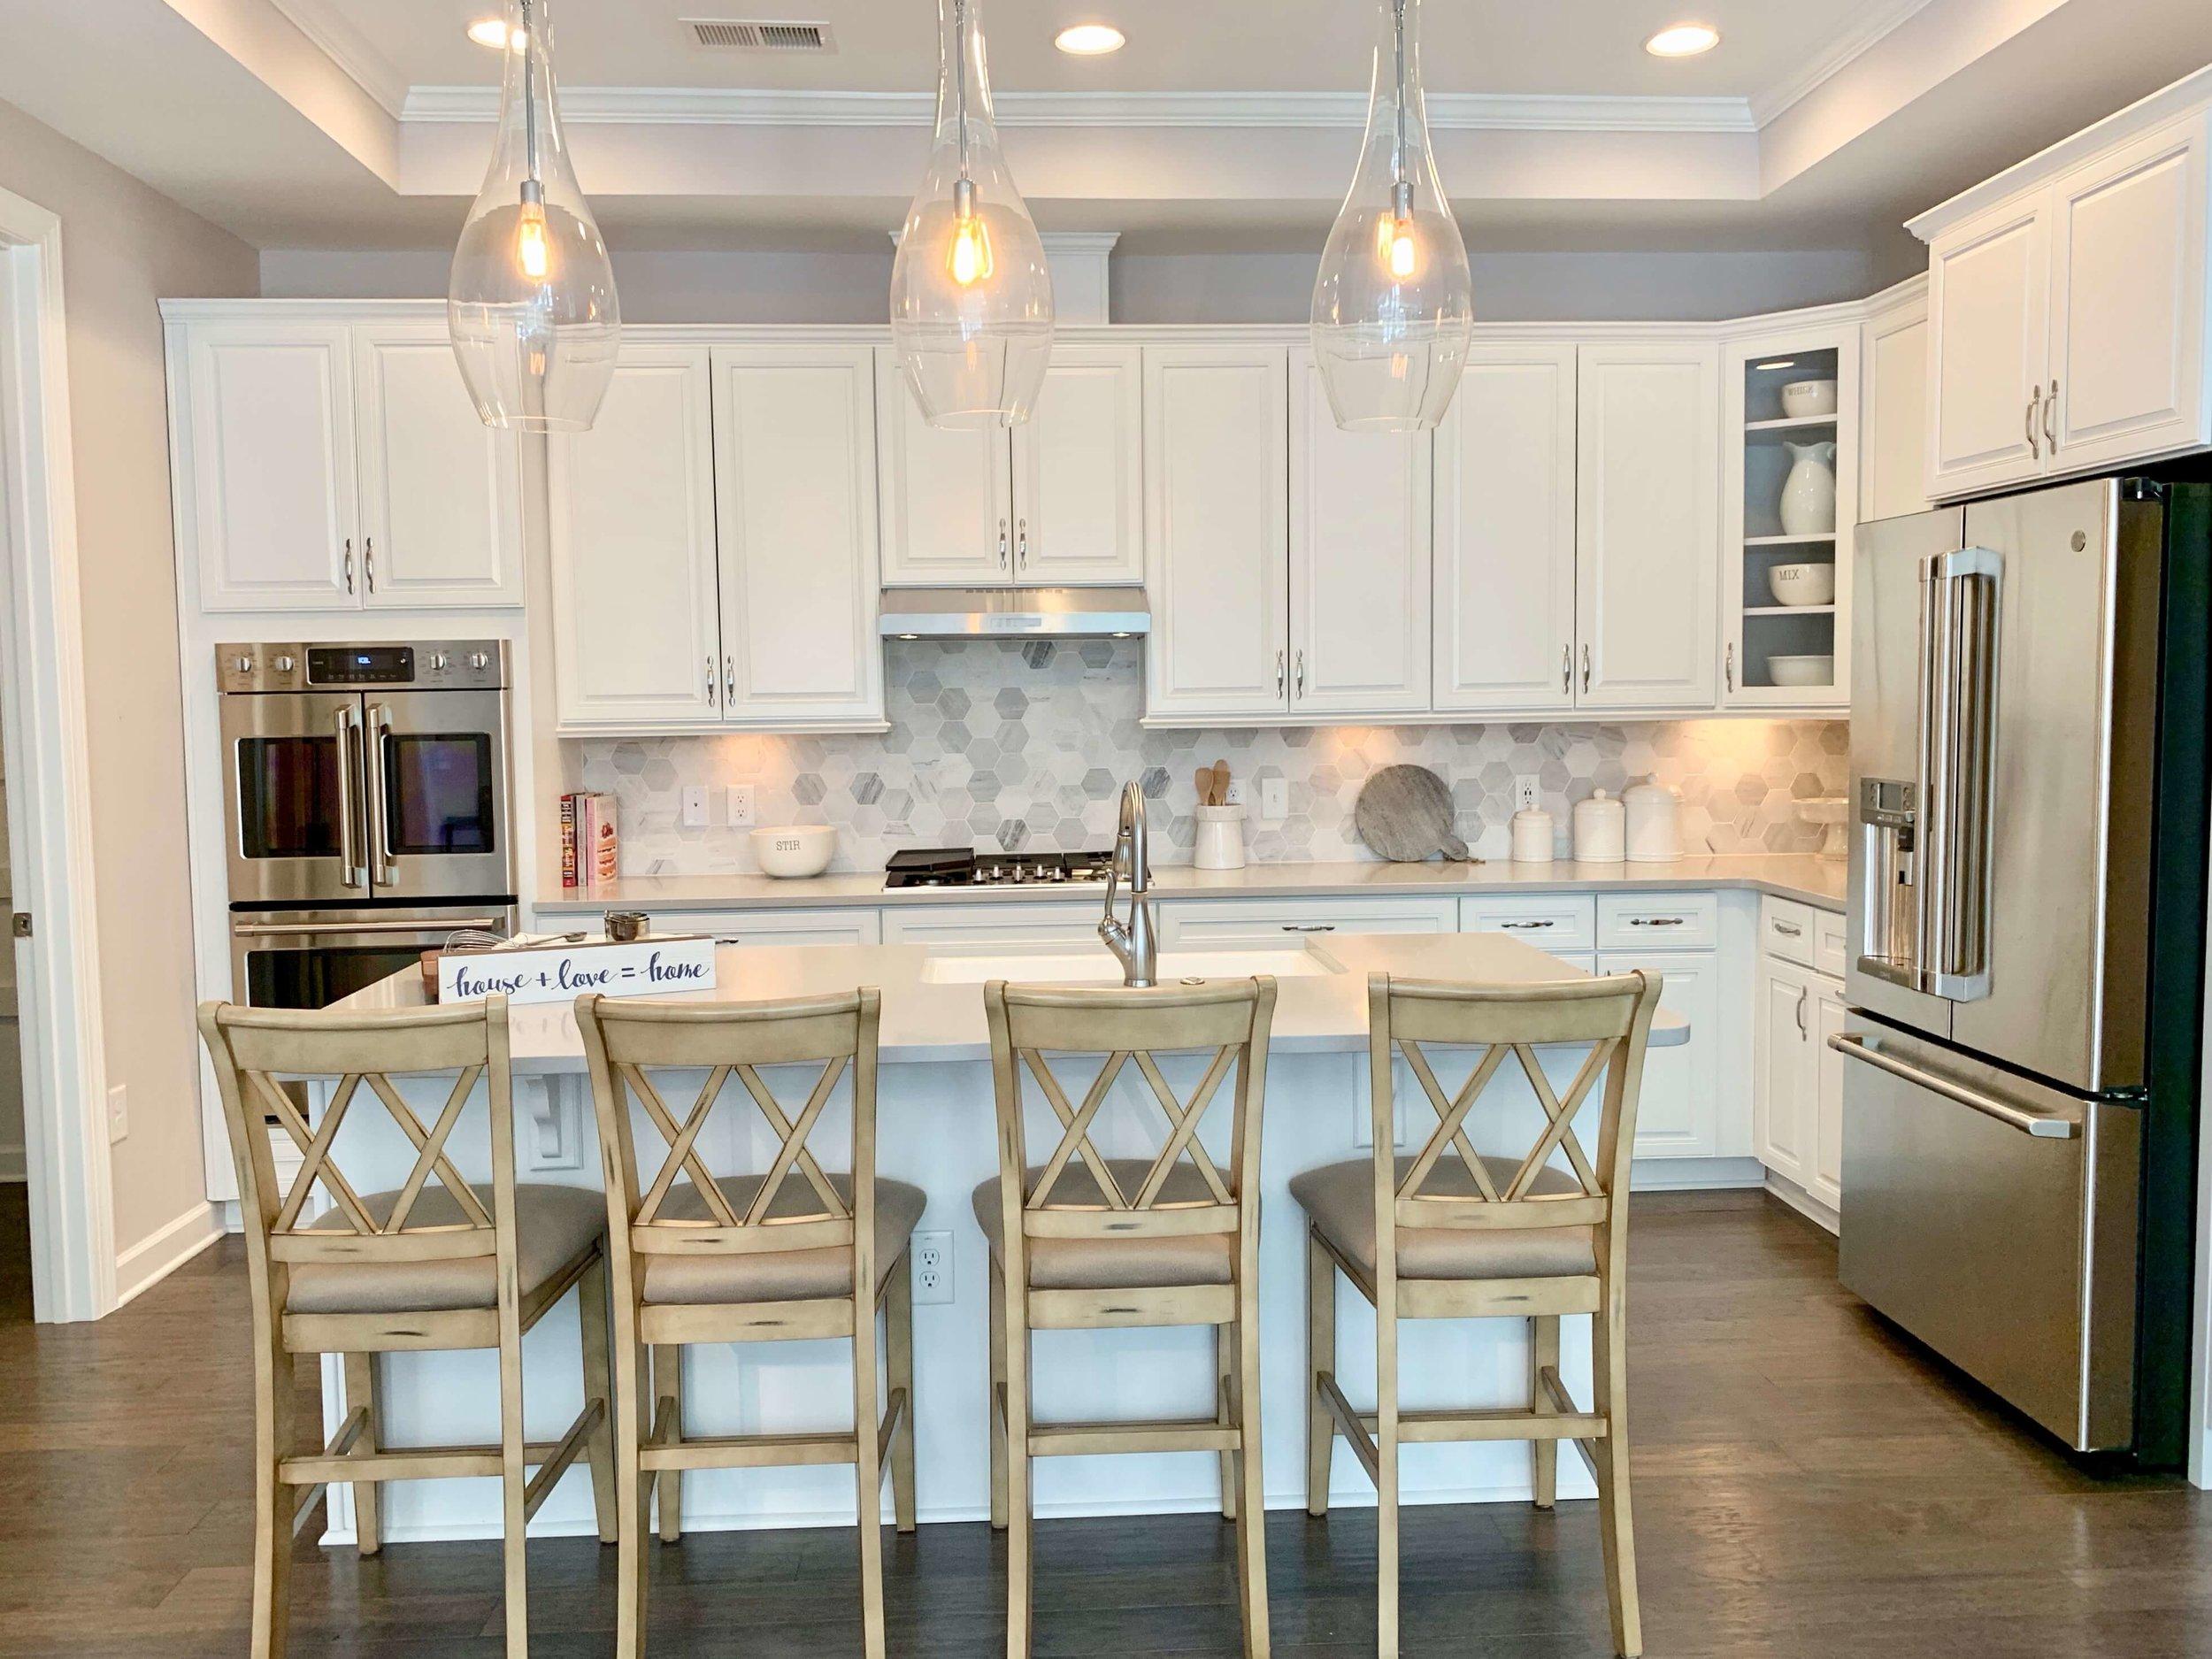 kitchen_island_seating_lighting_ideas.jpeg